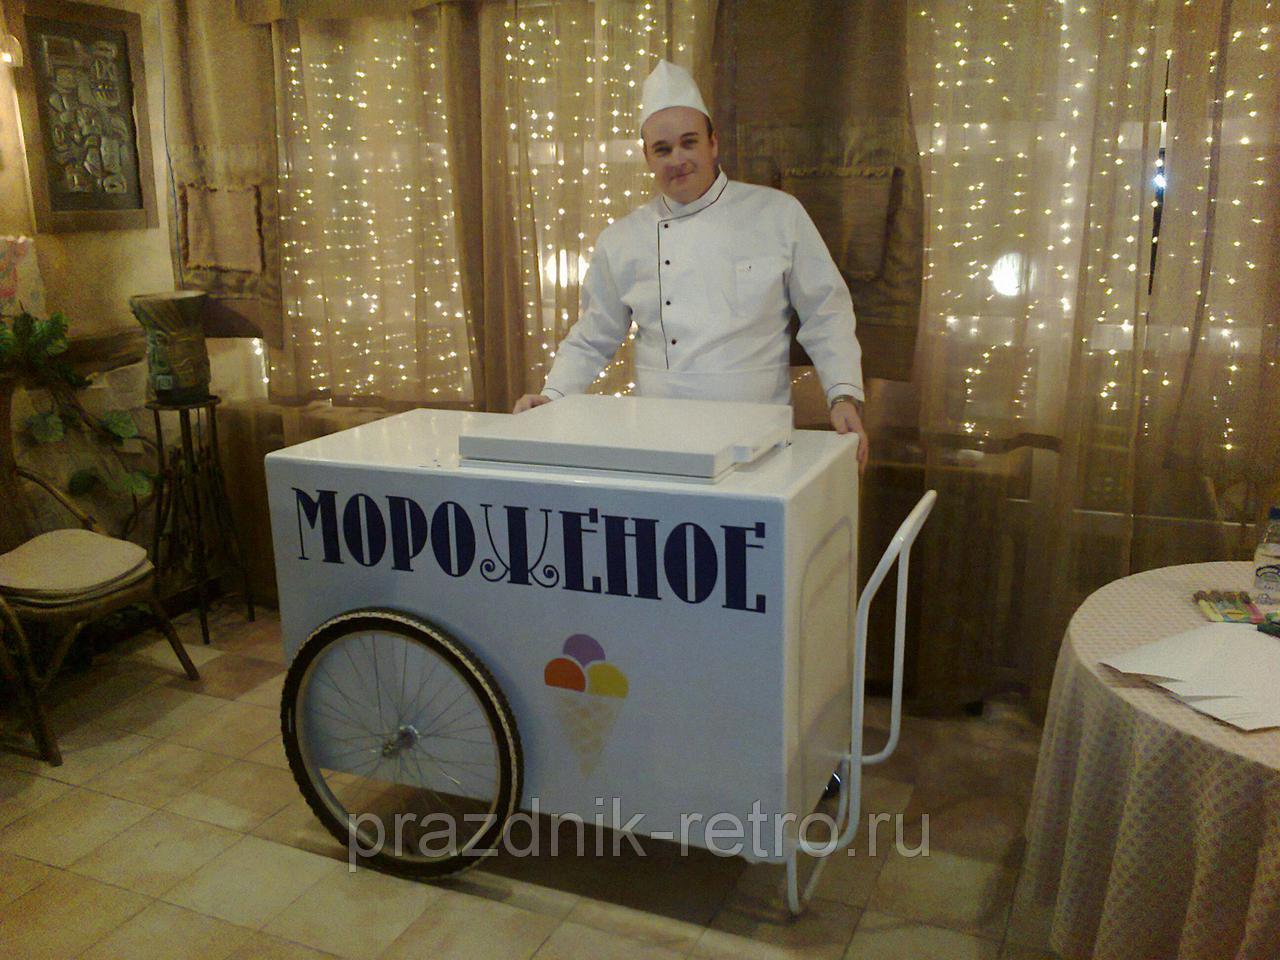 Ретро тележка с мороженым